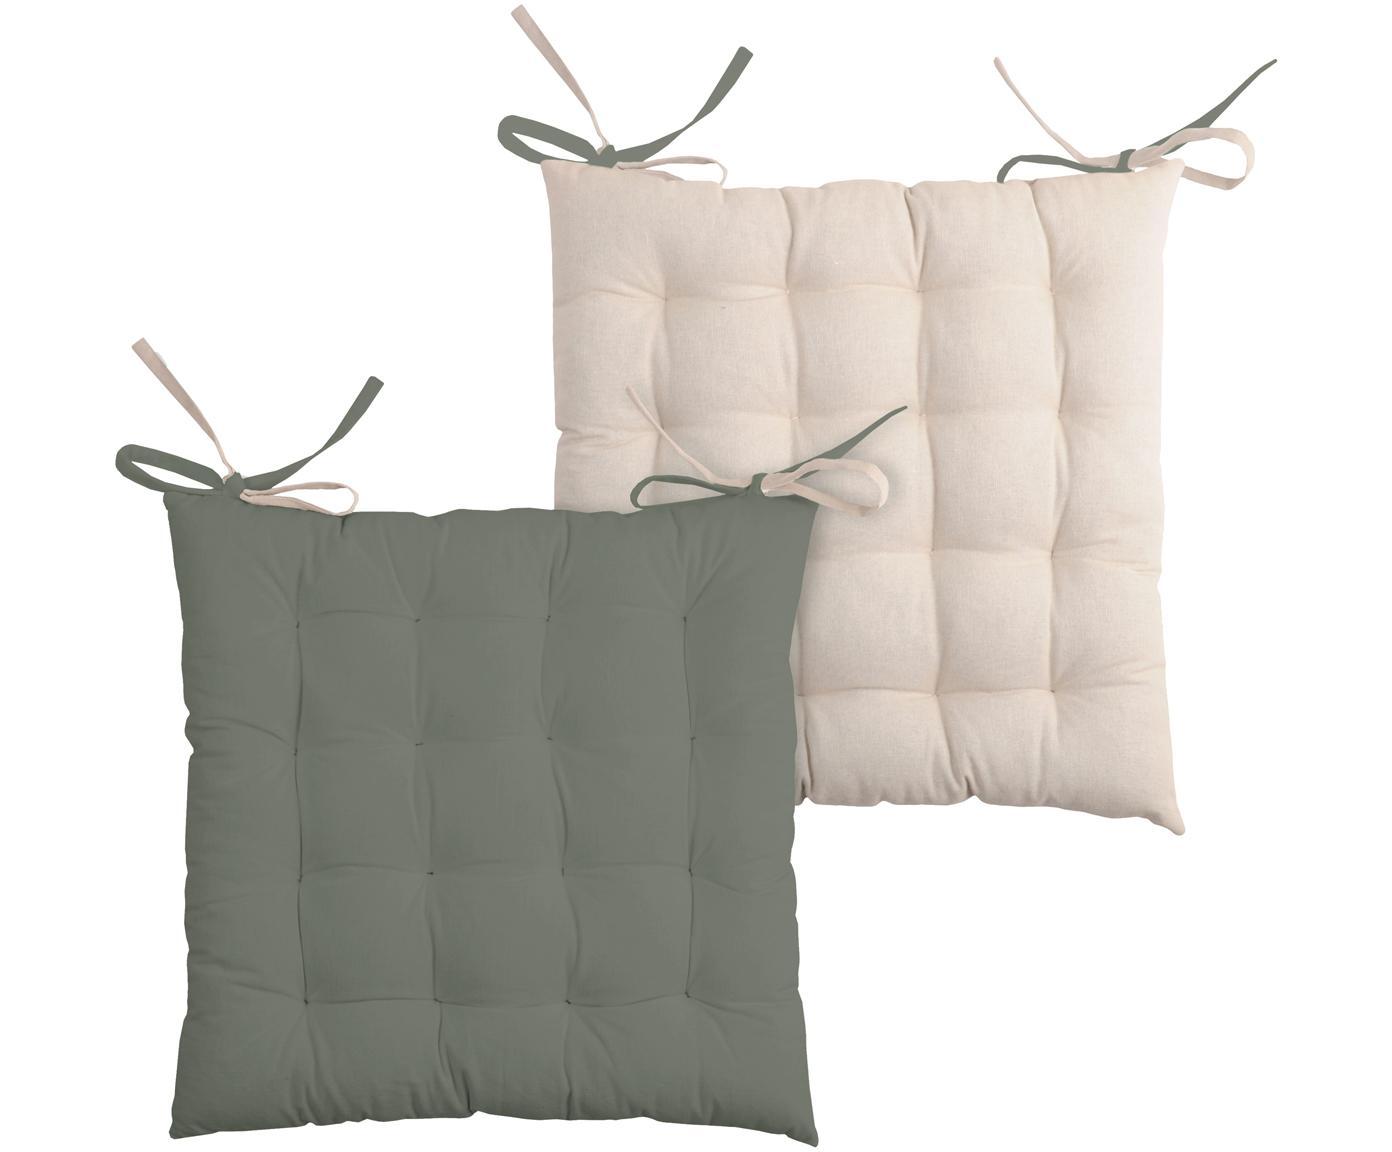 Dubbelzijdig stoelkussen Duo in kaki/beige, Kaki, lichtbeige, 40 x 40 cm